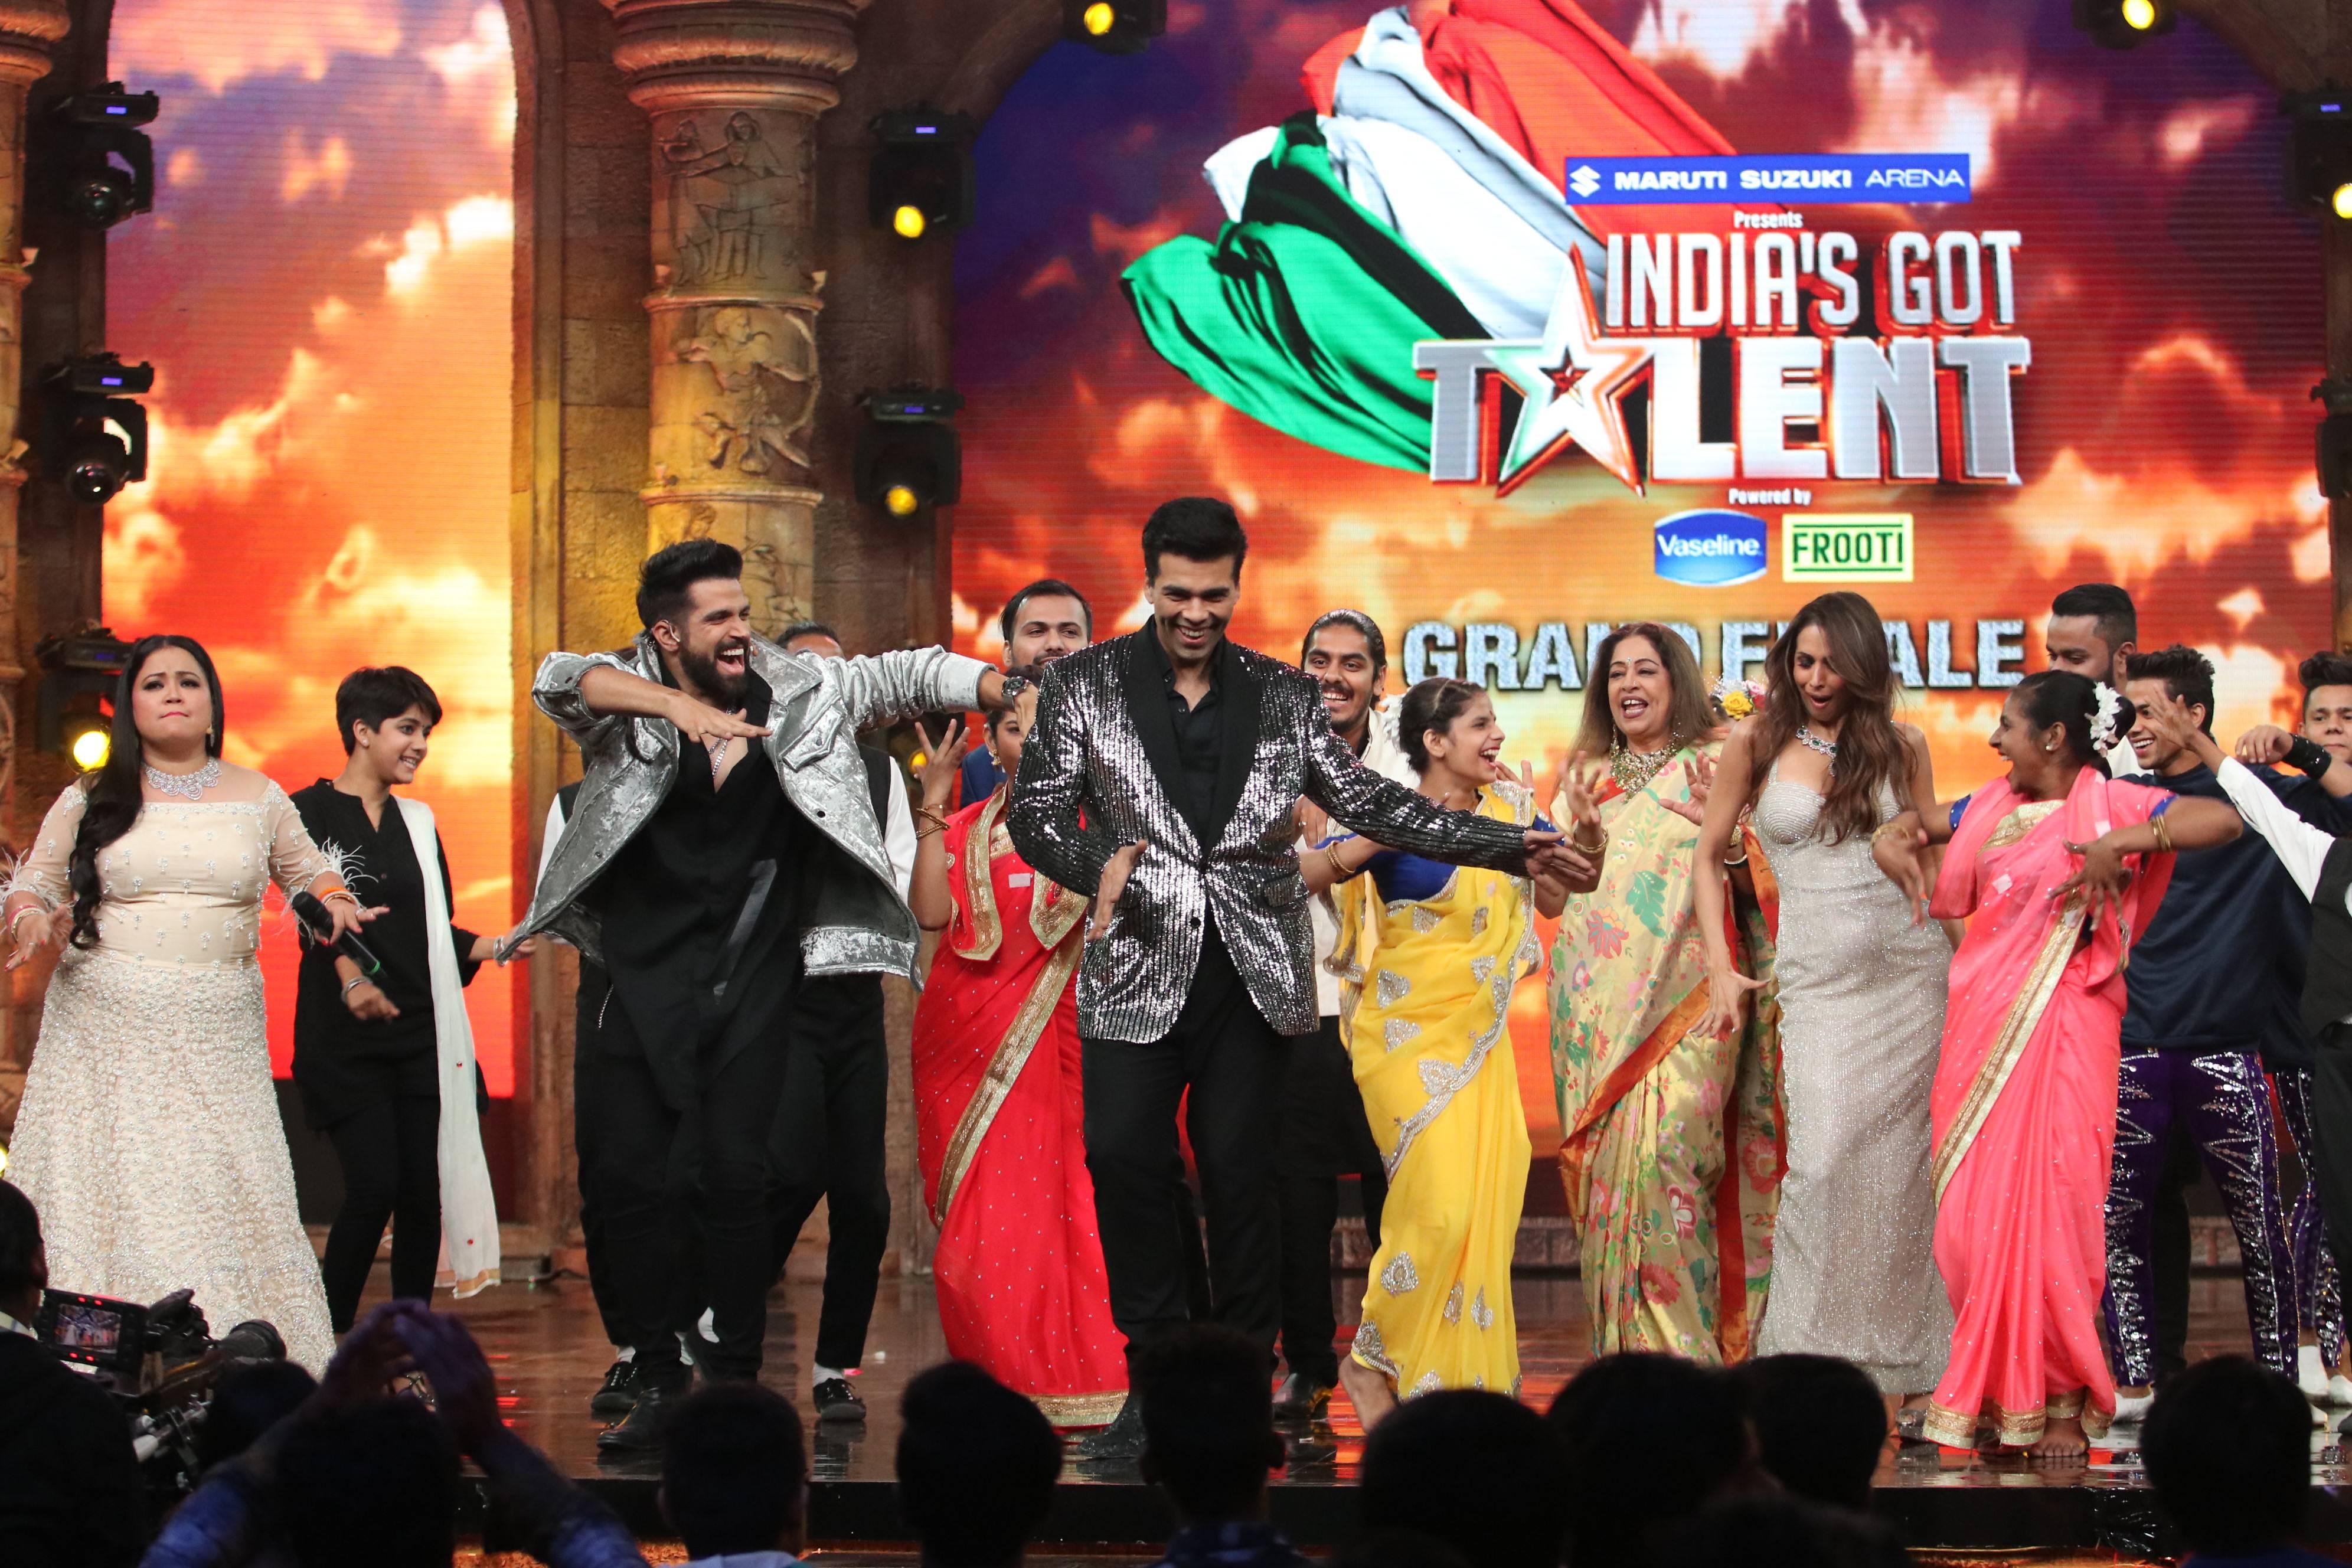 A quick sneak peek into the season finale of India's Got Talent Season 8!